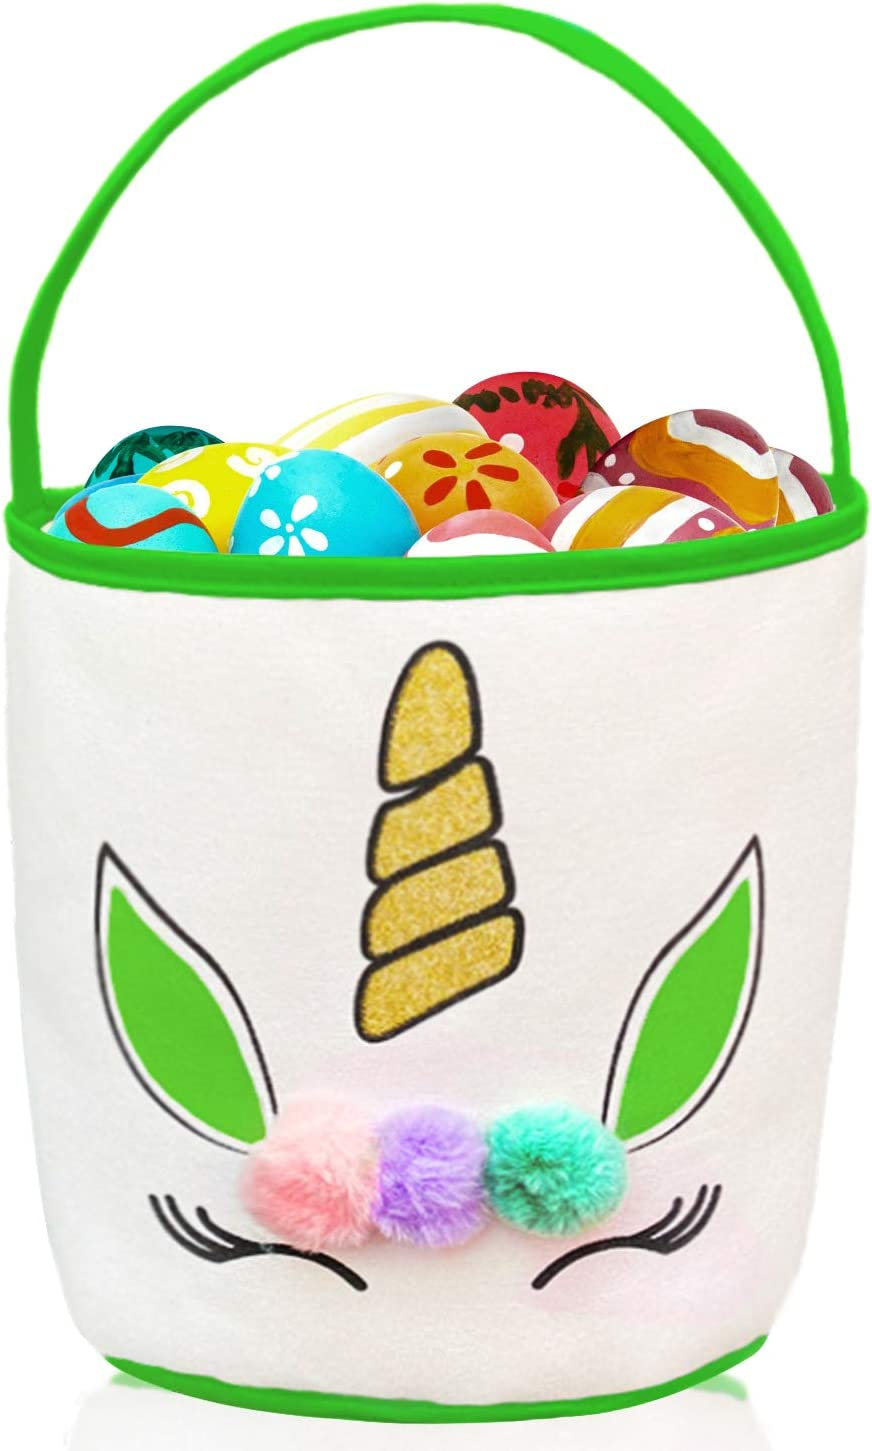 Leesgel Unicorn Easter Baskets Ranking TOP2 for Basket Challenge the lowest price of Japan